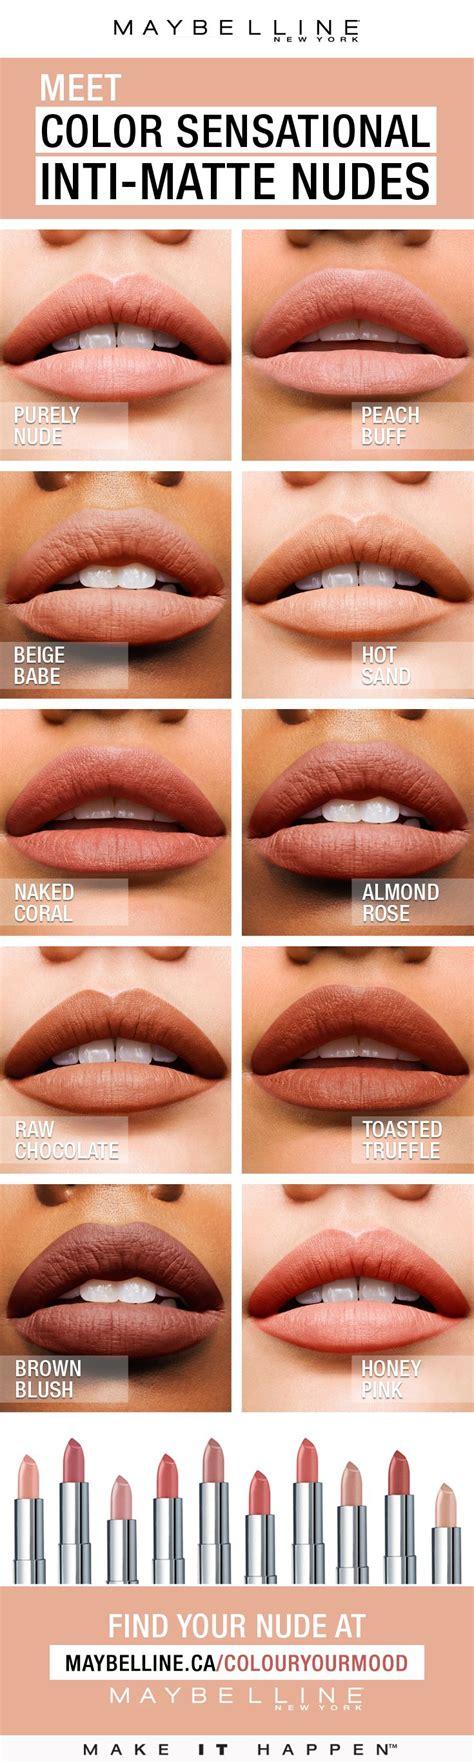 Warm Golden by Color Sensational 174 Inti Matte Lipstick Features Warm